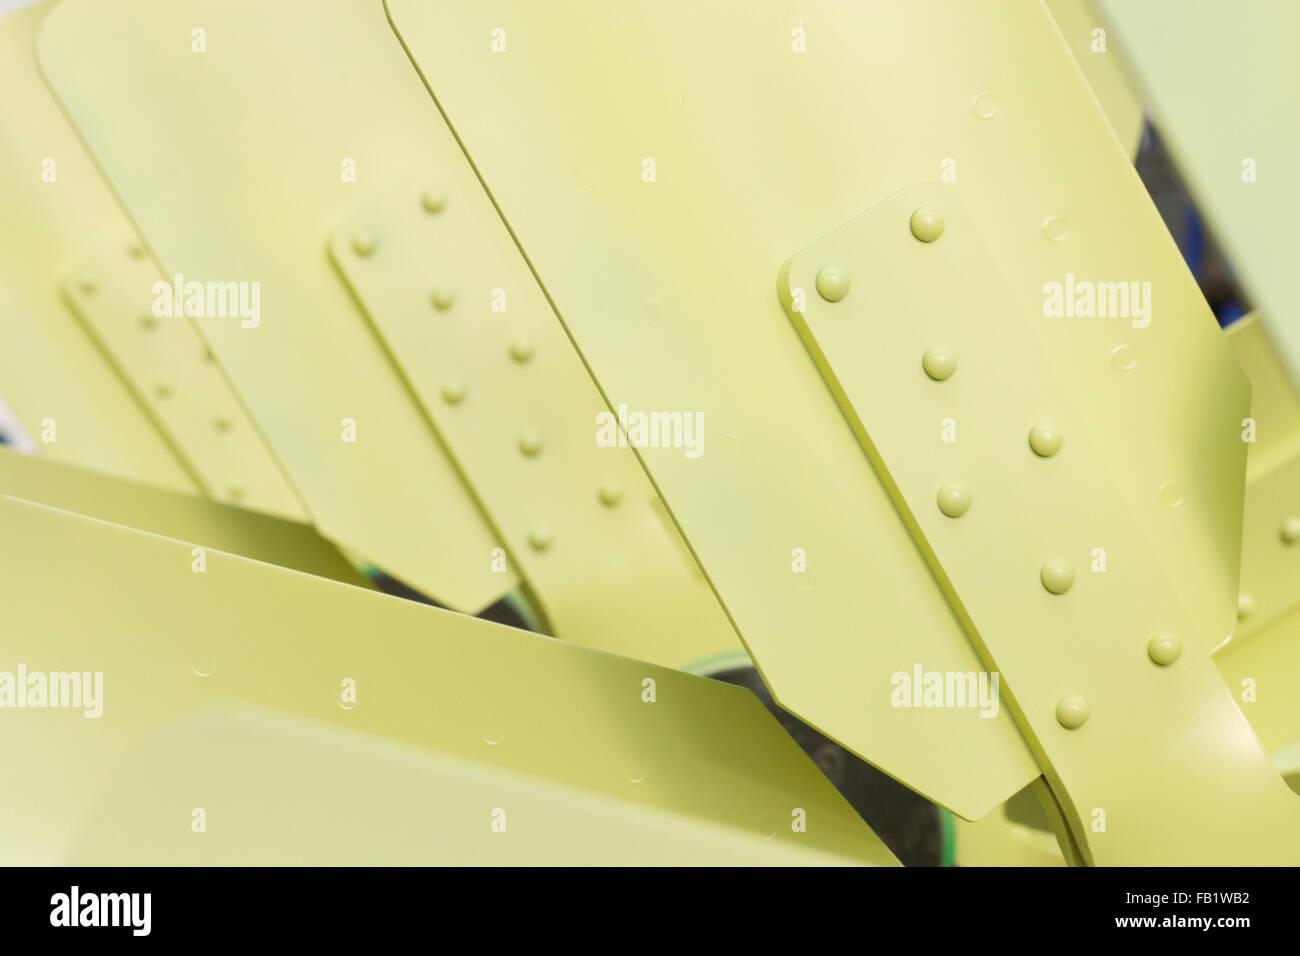 Nahaufnahme von industriellen Metall Lüfterflügel Stockbild